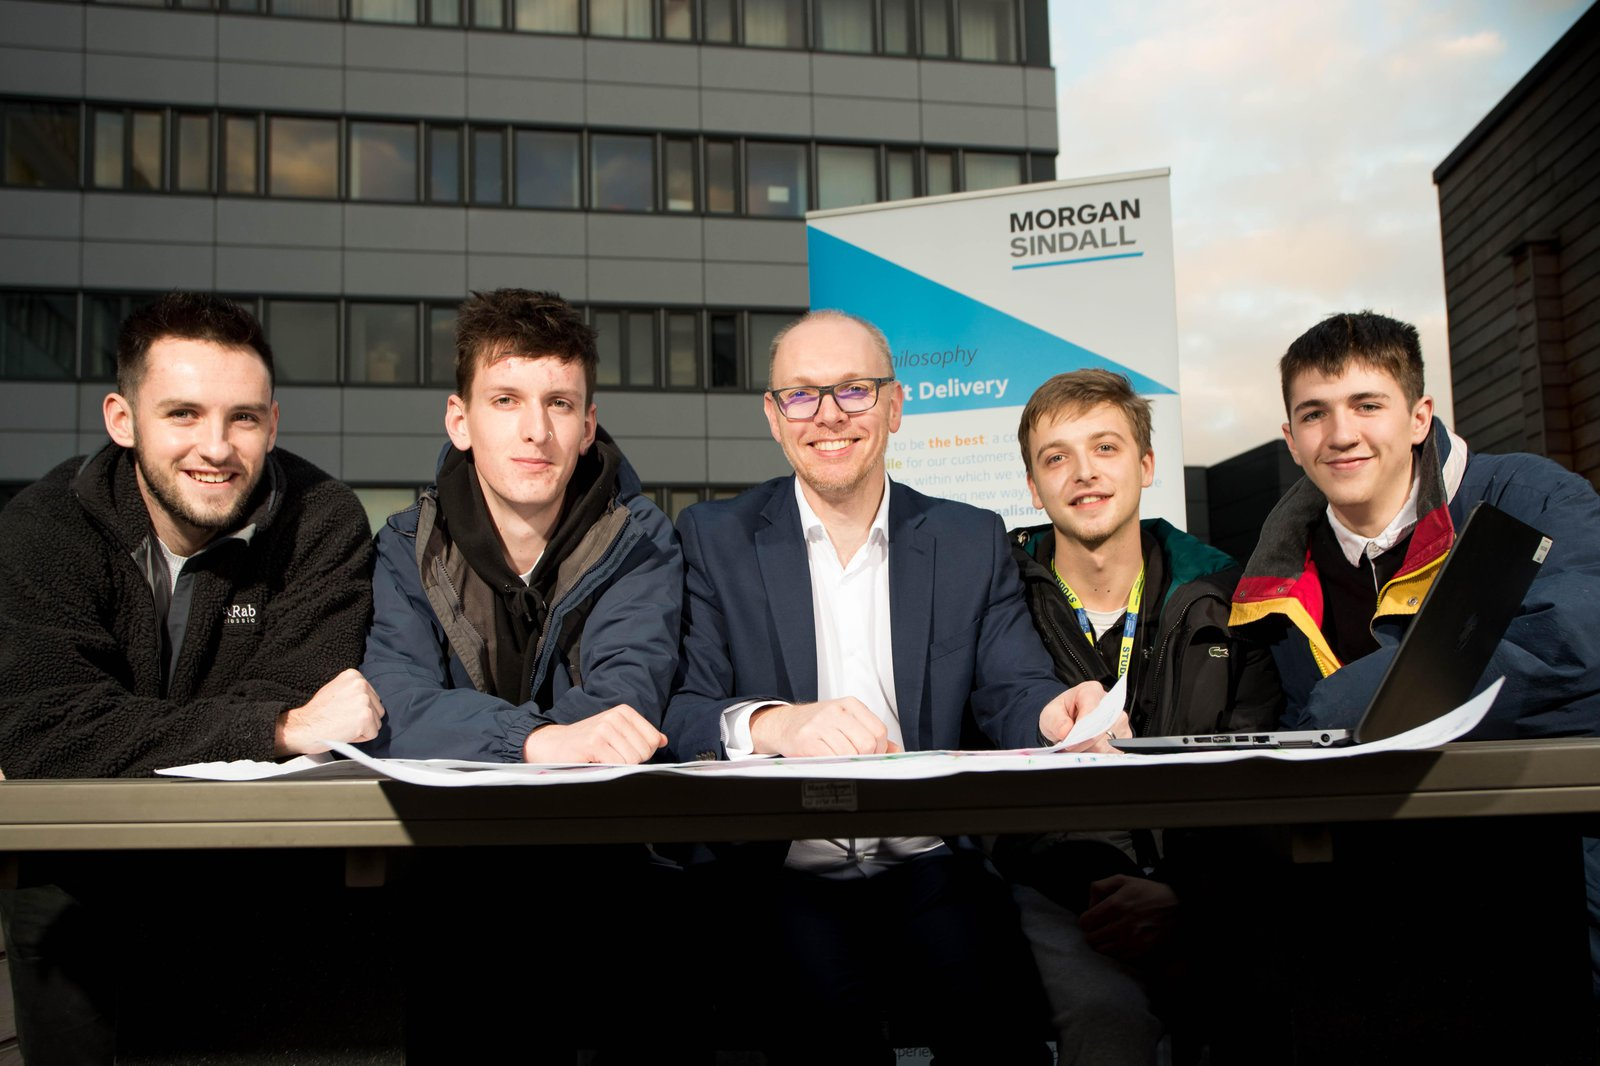 The group of students taking part in the CIOB challenge - Kyle Dougan Alex Dawes Owen Ashton Ben Tregear Jack Heaney